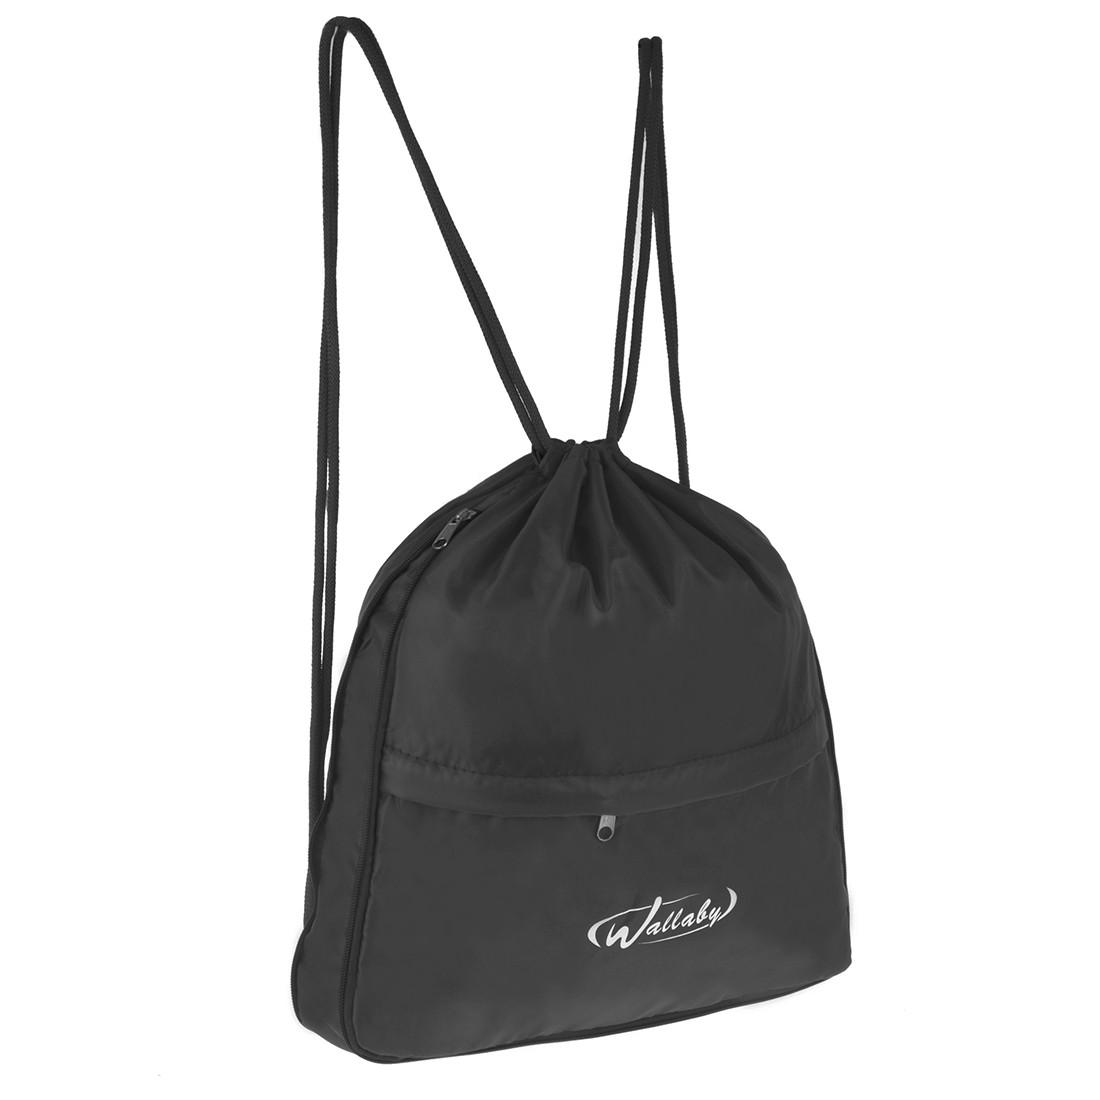 Рюкзак-котомка Wallaby 35х38х1 чёрный для обуви и сменки ткань нейлон  в 28271ч